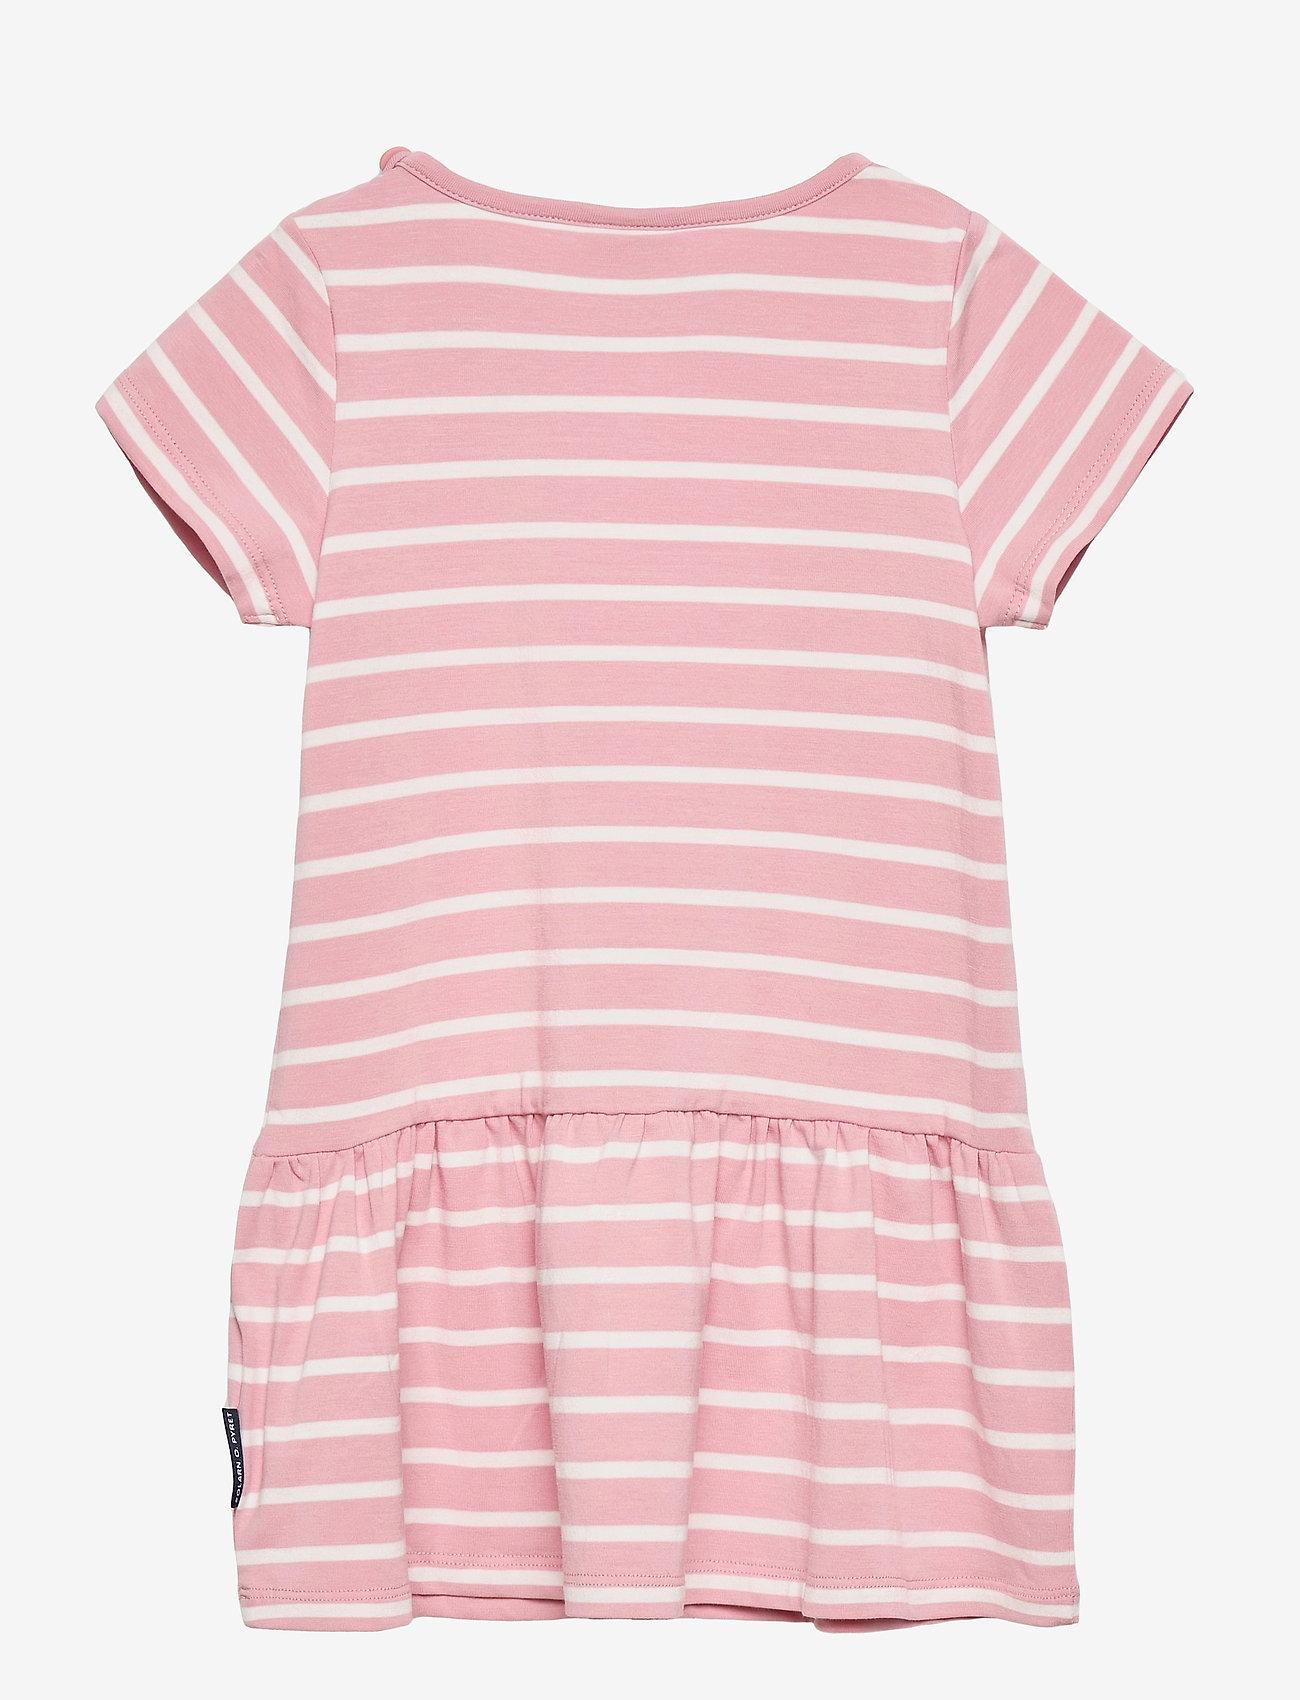 Polarn O. Pyret - Dress jersey striped s/s Preschool - kleider - bridal rose - 1